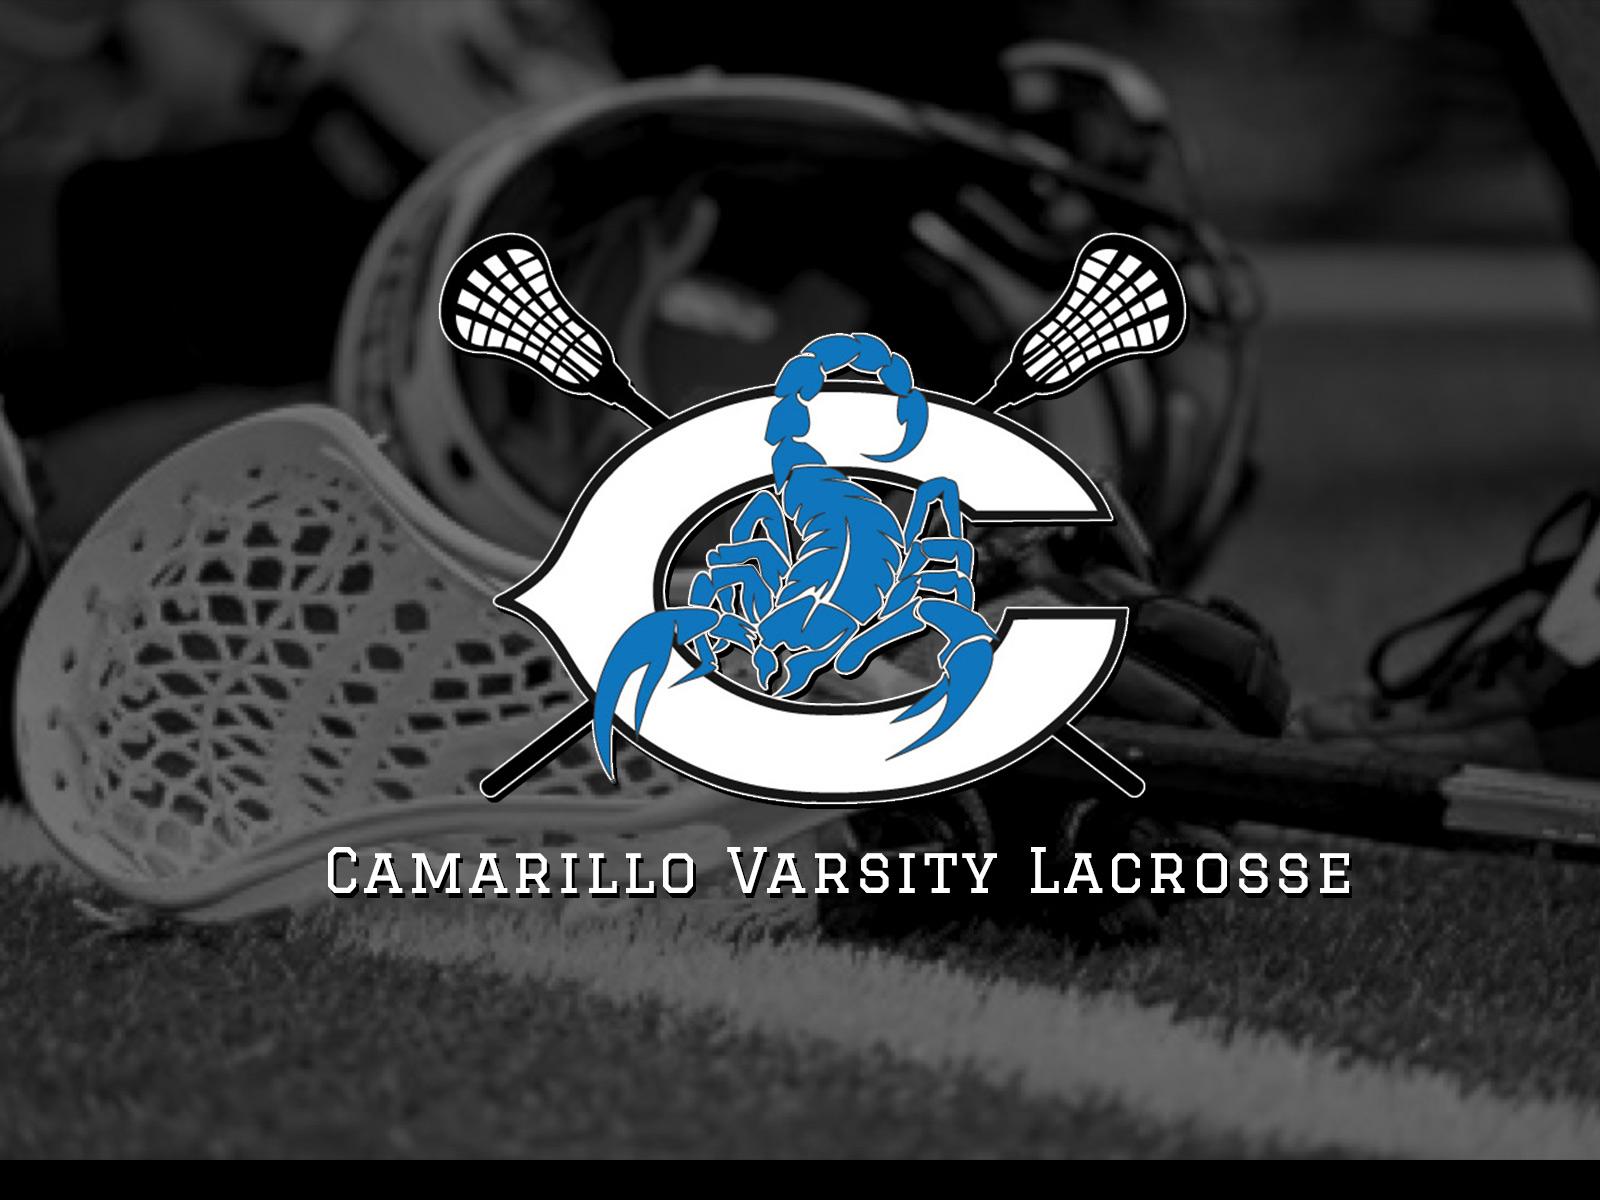 Camarillo Varsity Lacrosse